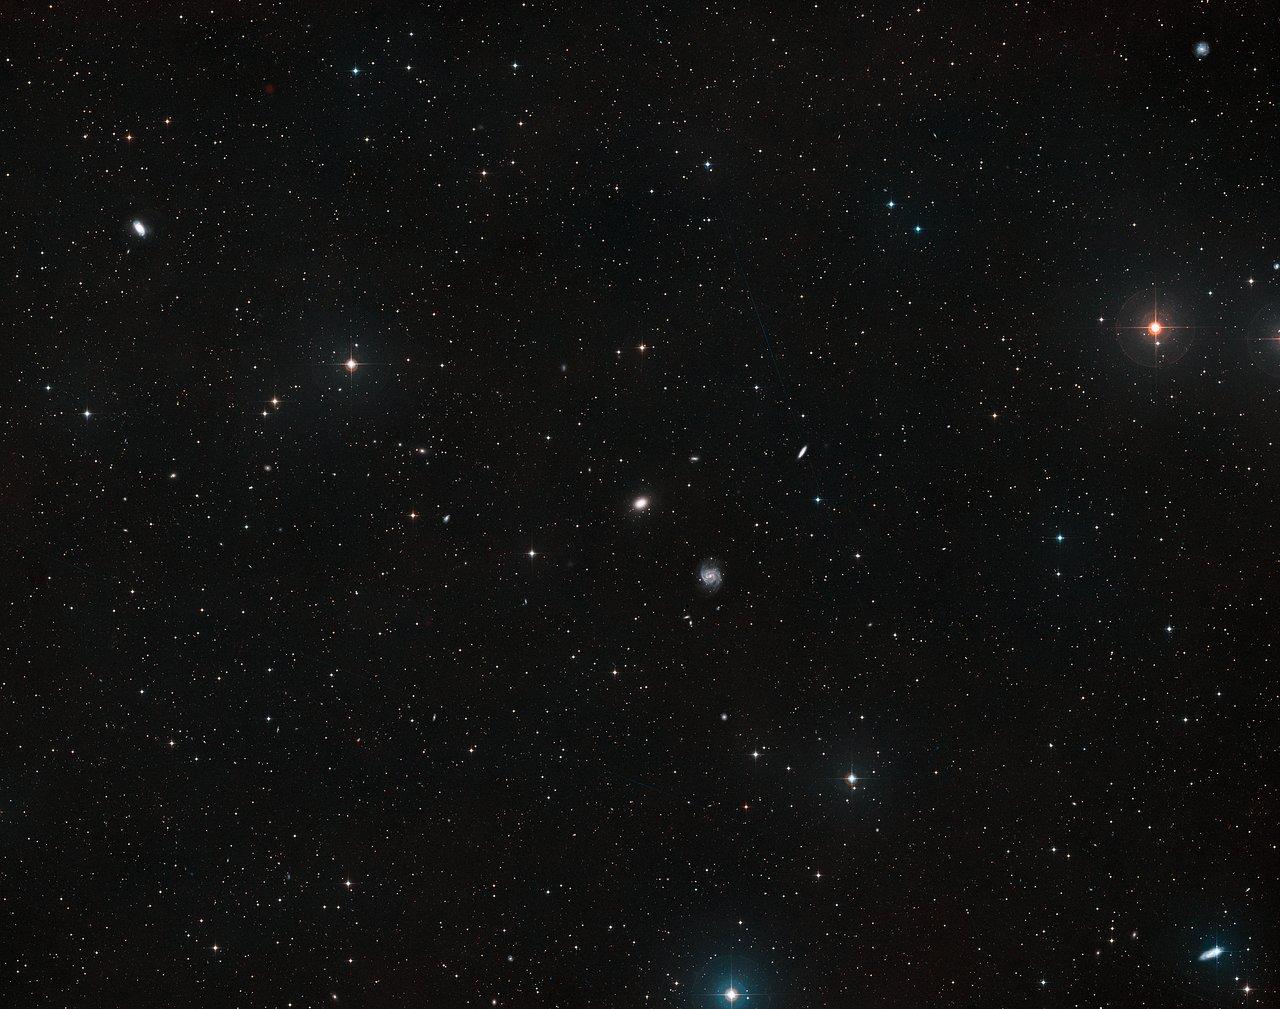 Science Release: New Hubble Data Explains Missing Dark Matter